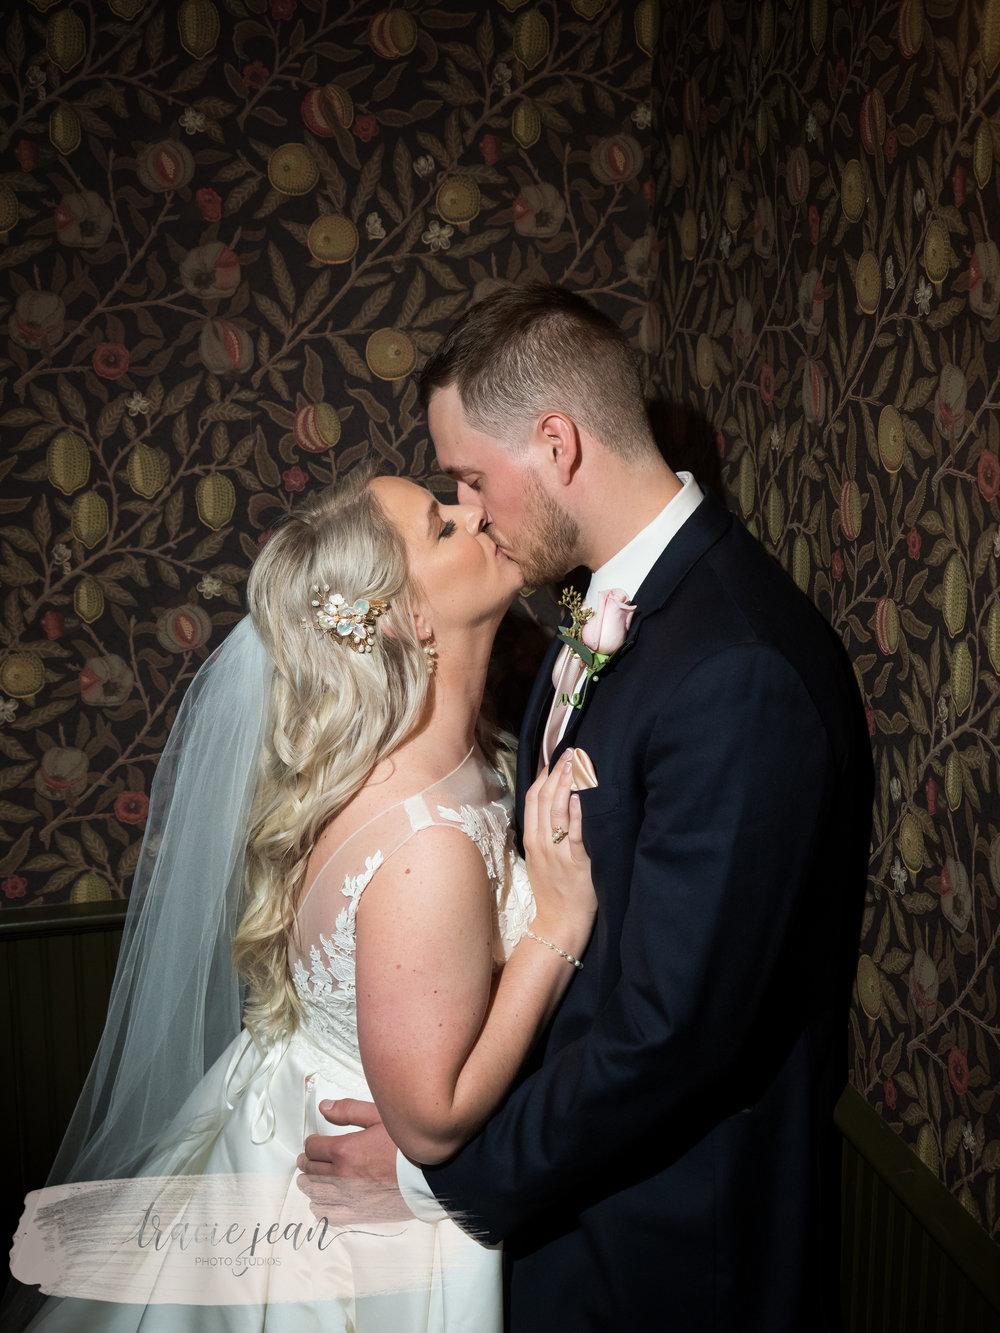 Husband & Wife Kiss Close